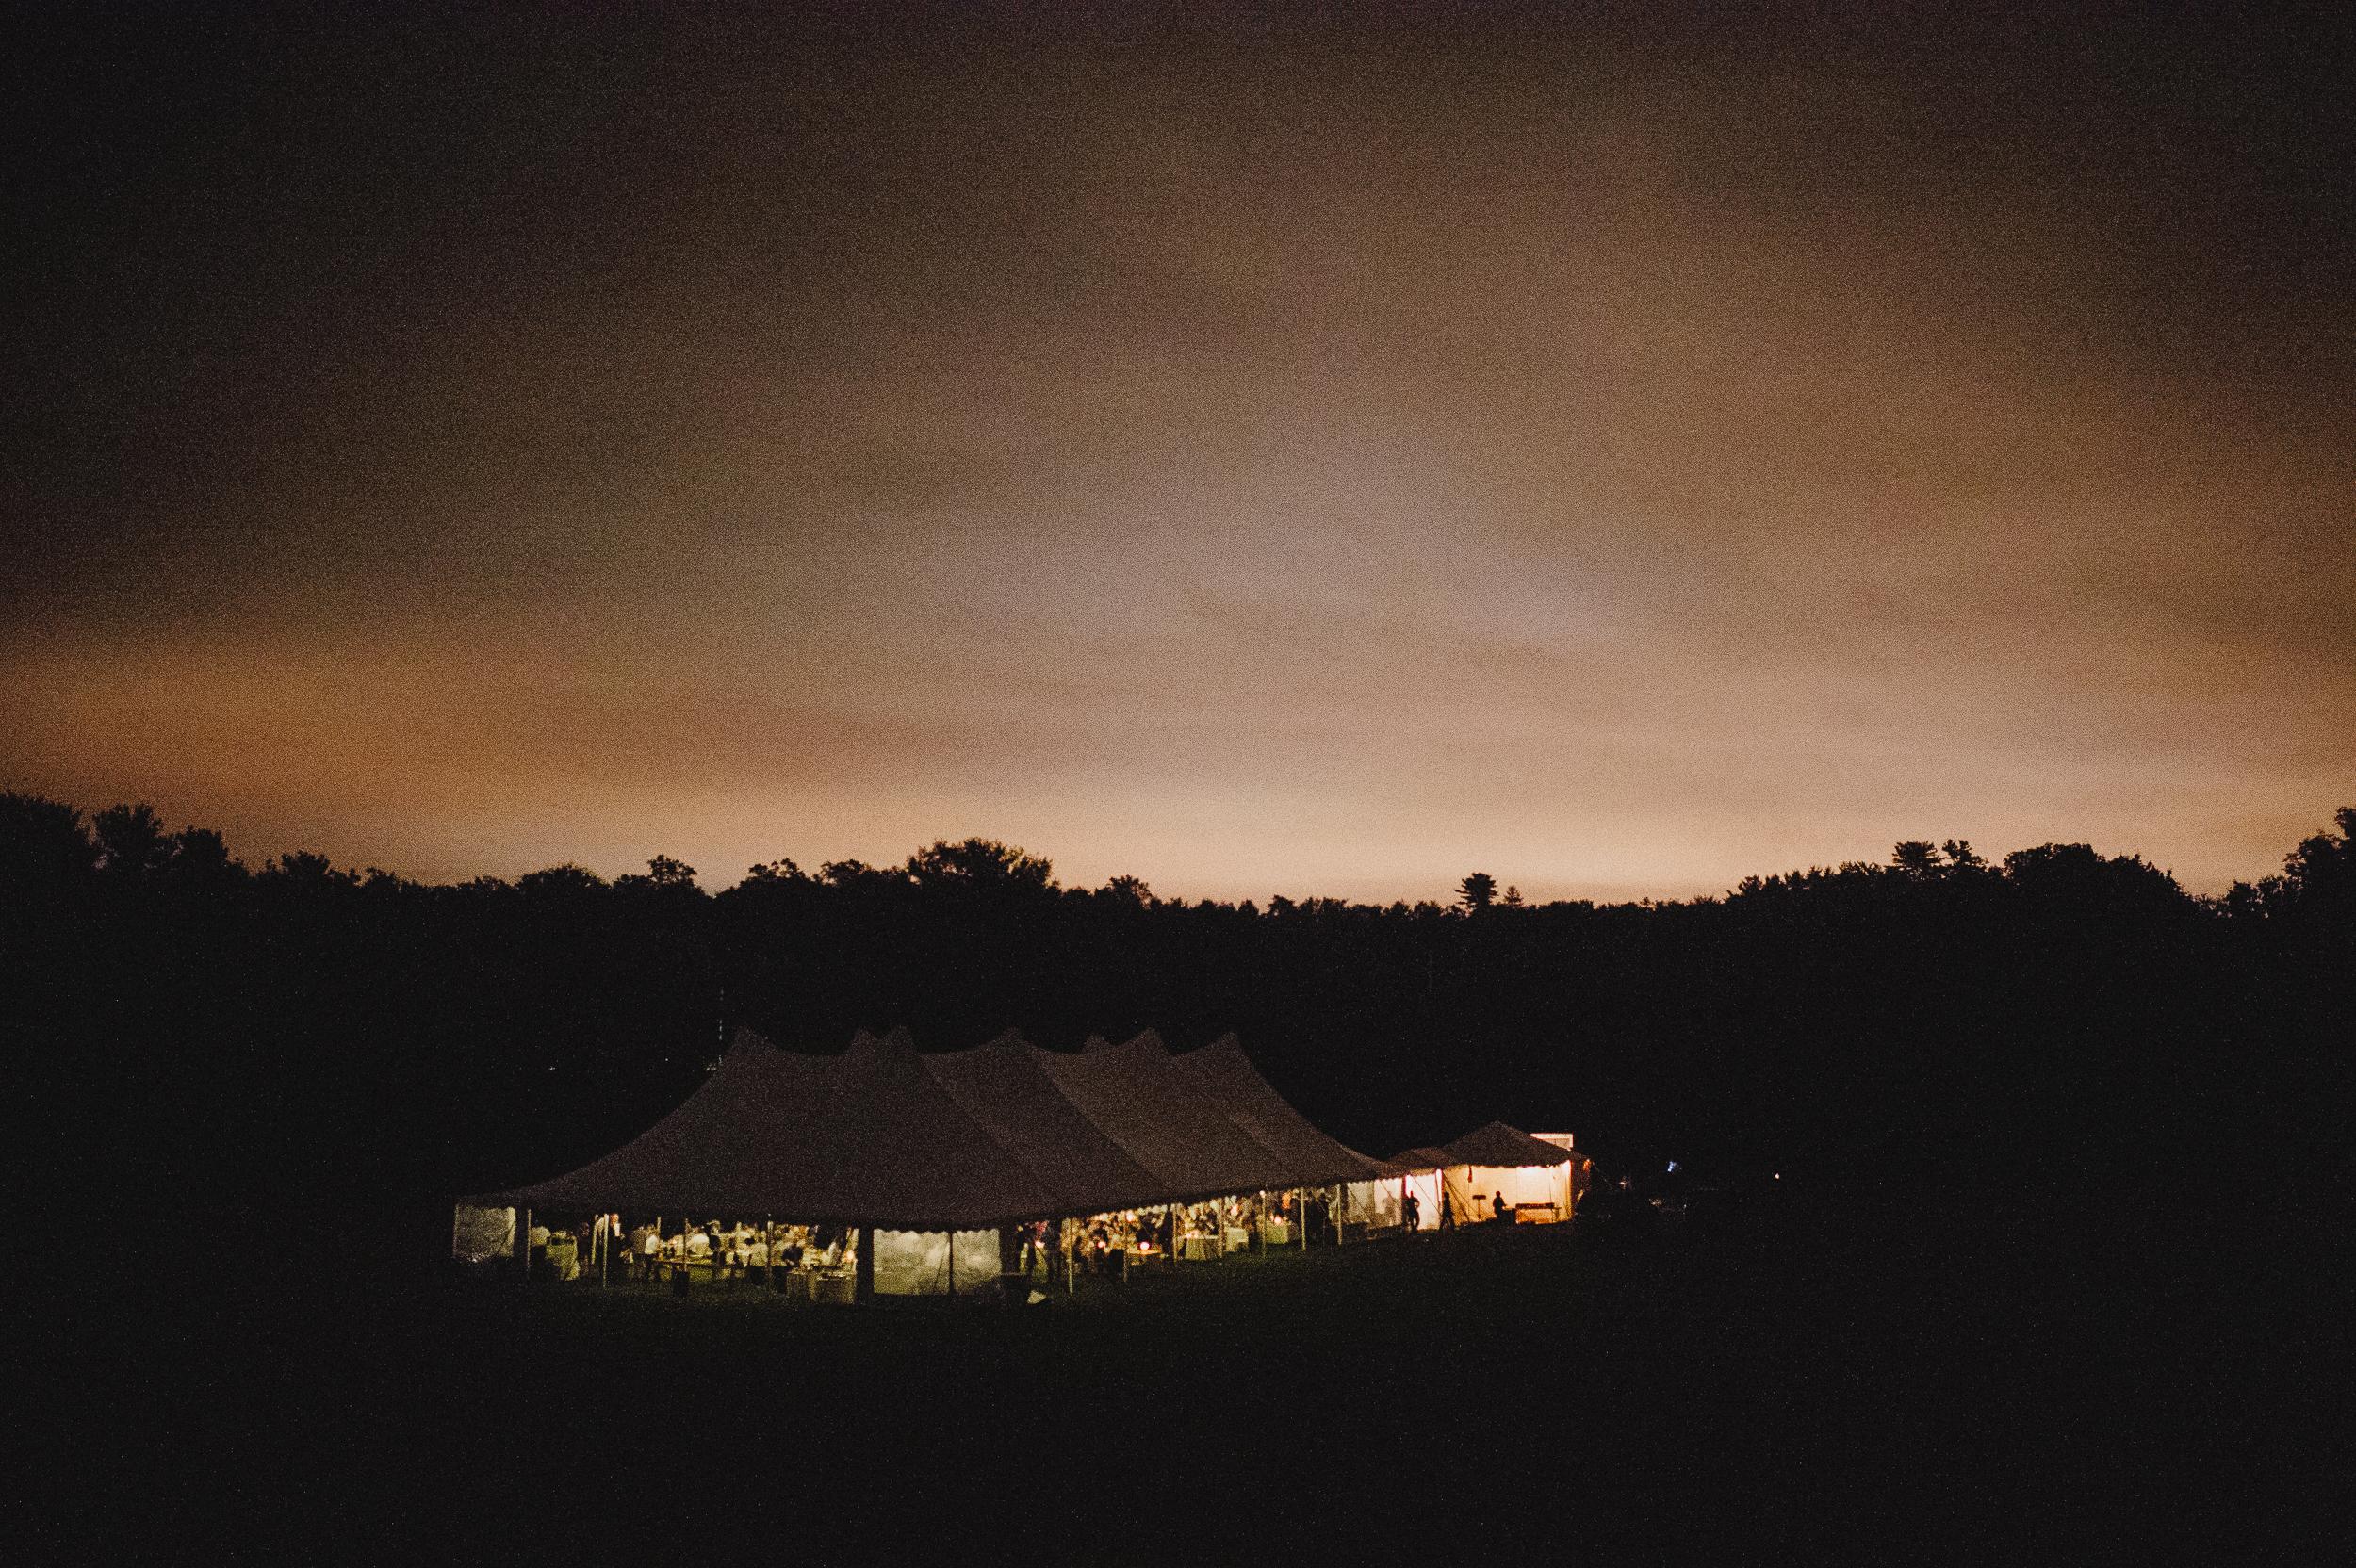 delaware-estate-wedding-photographer-pat-robinson-photography-129.jpg